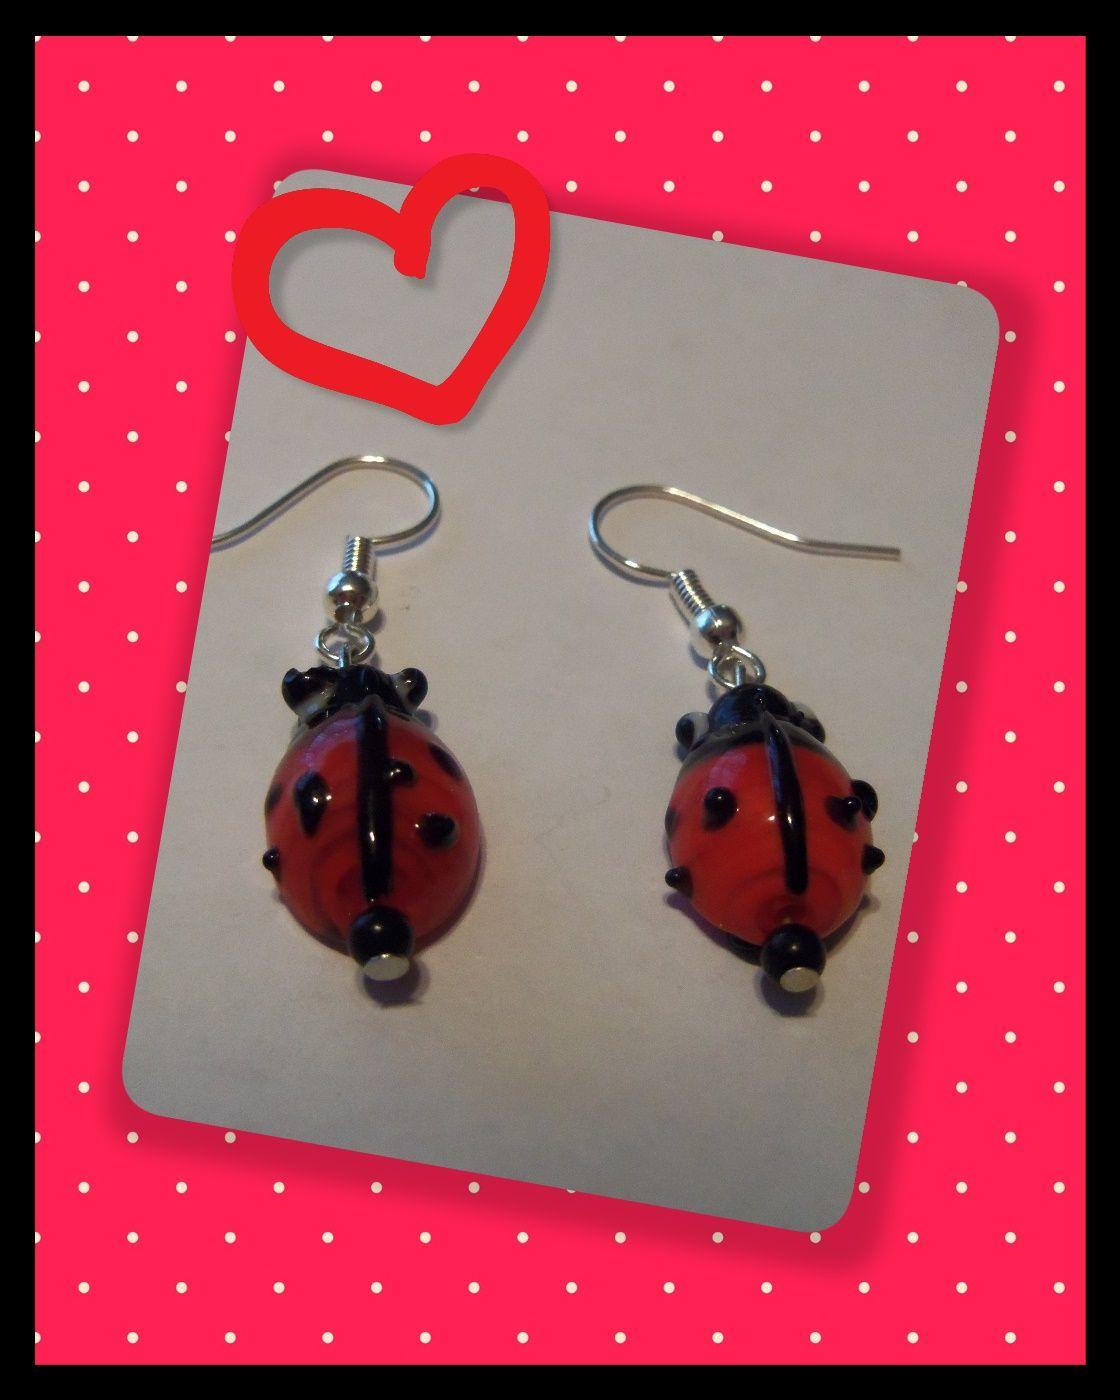 Earrings made using ladybug glass beads and small black